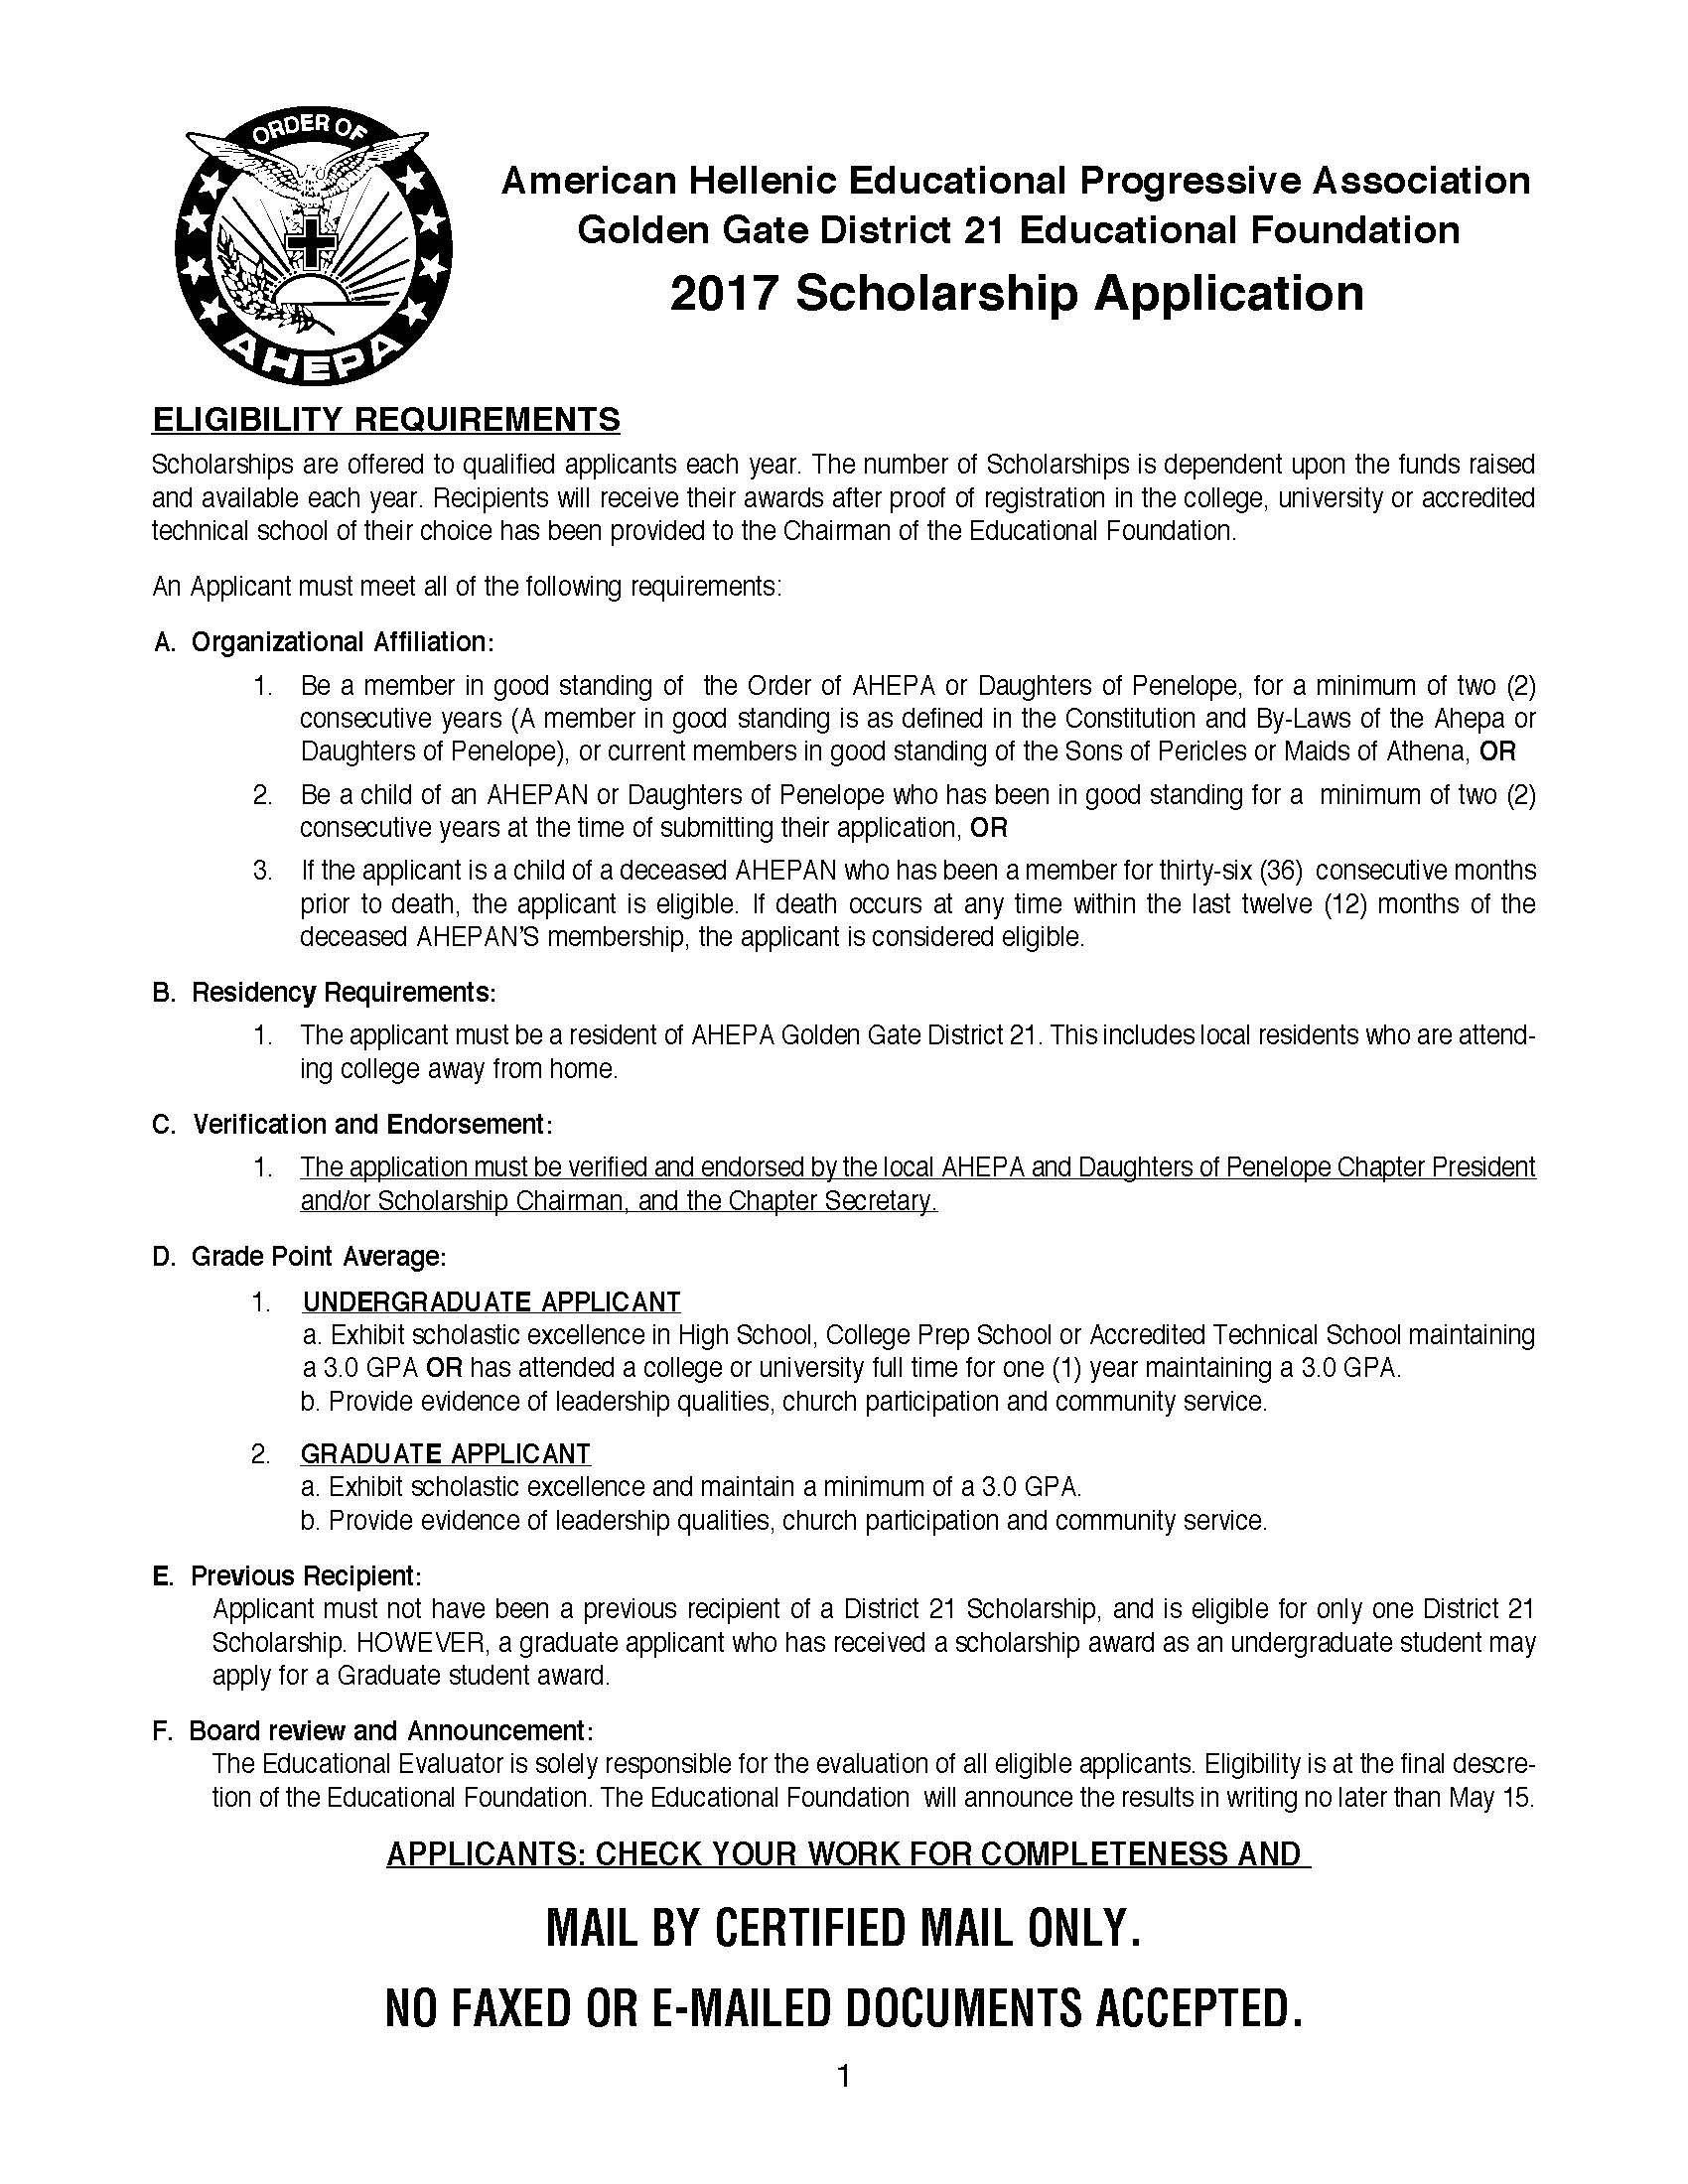 ahepa scholarships district 21 ahepa educational foundation